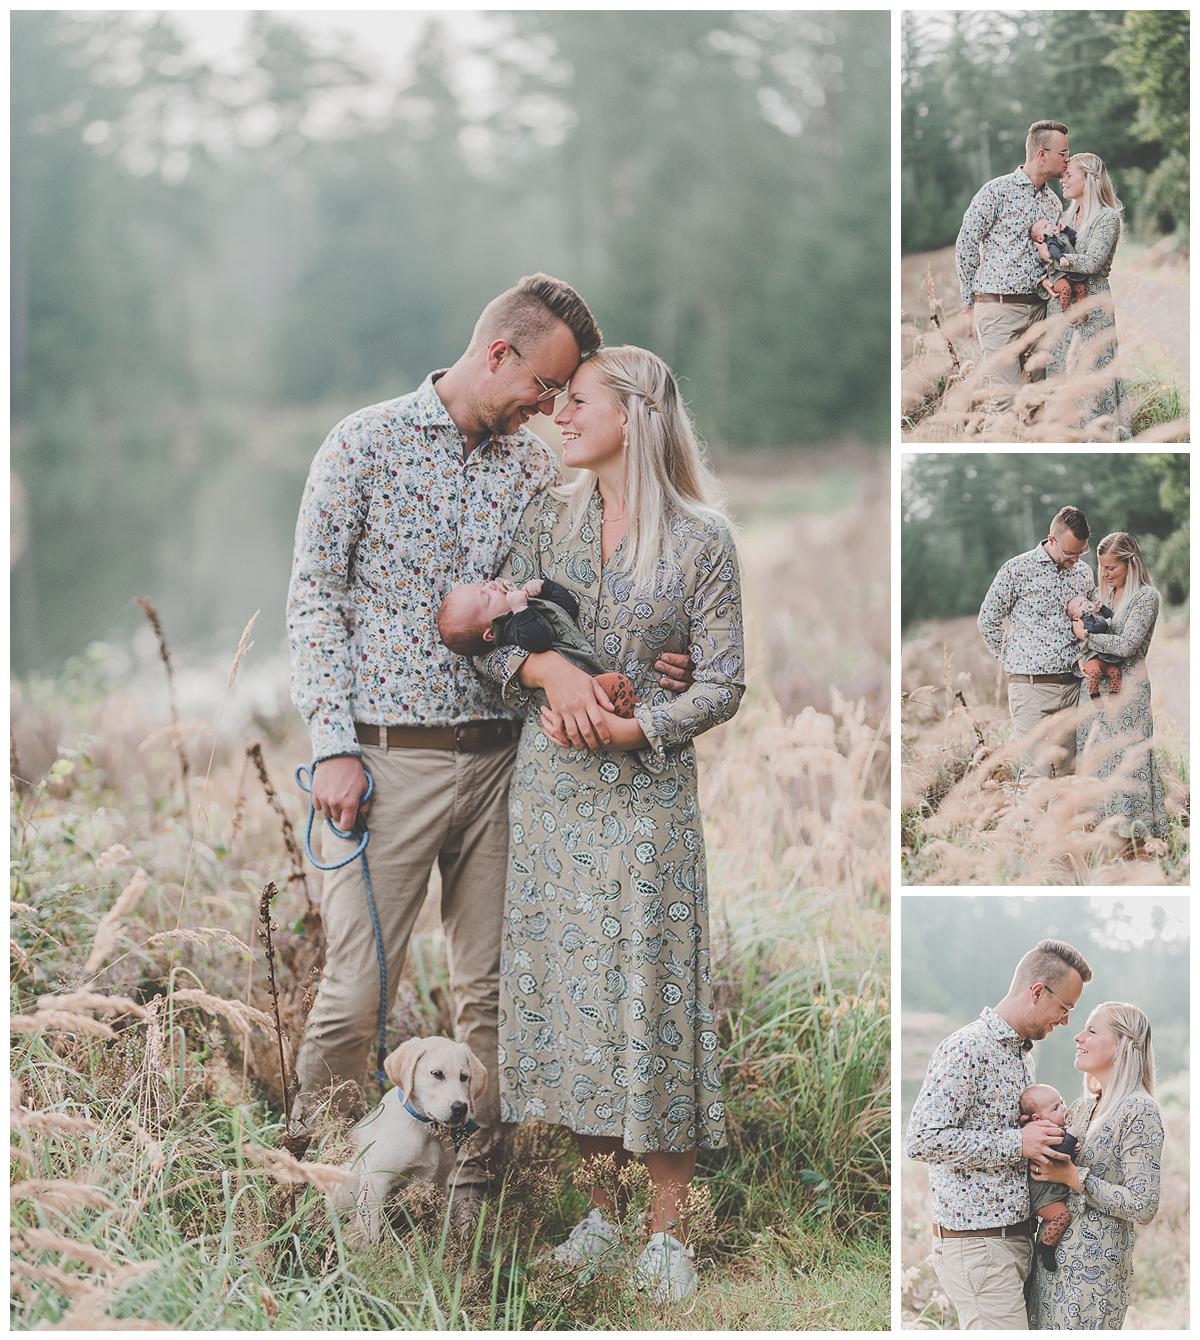 chantal nijhof studio fotografie veluwe gelderland fotograaf fotoshoot gezinsfotografie familiefotoshoot gezinsfotoshoot heerde epe wapenveld